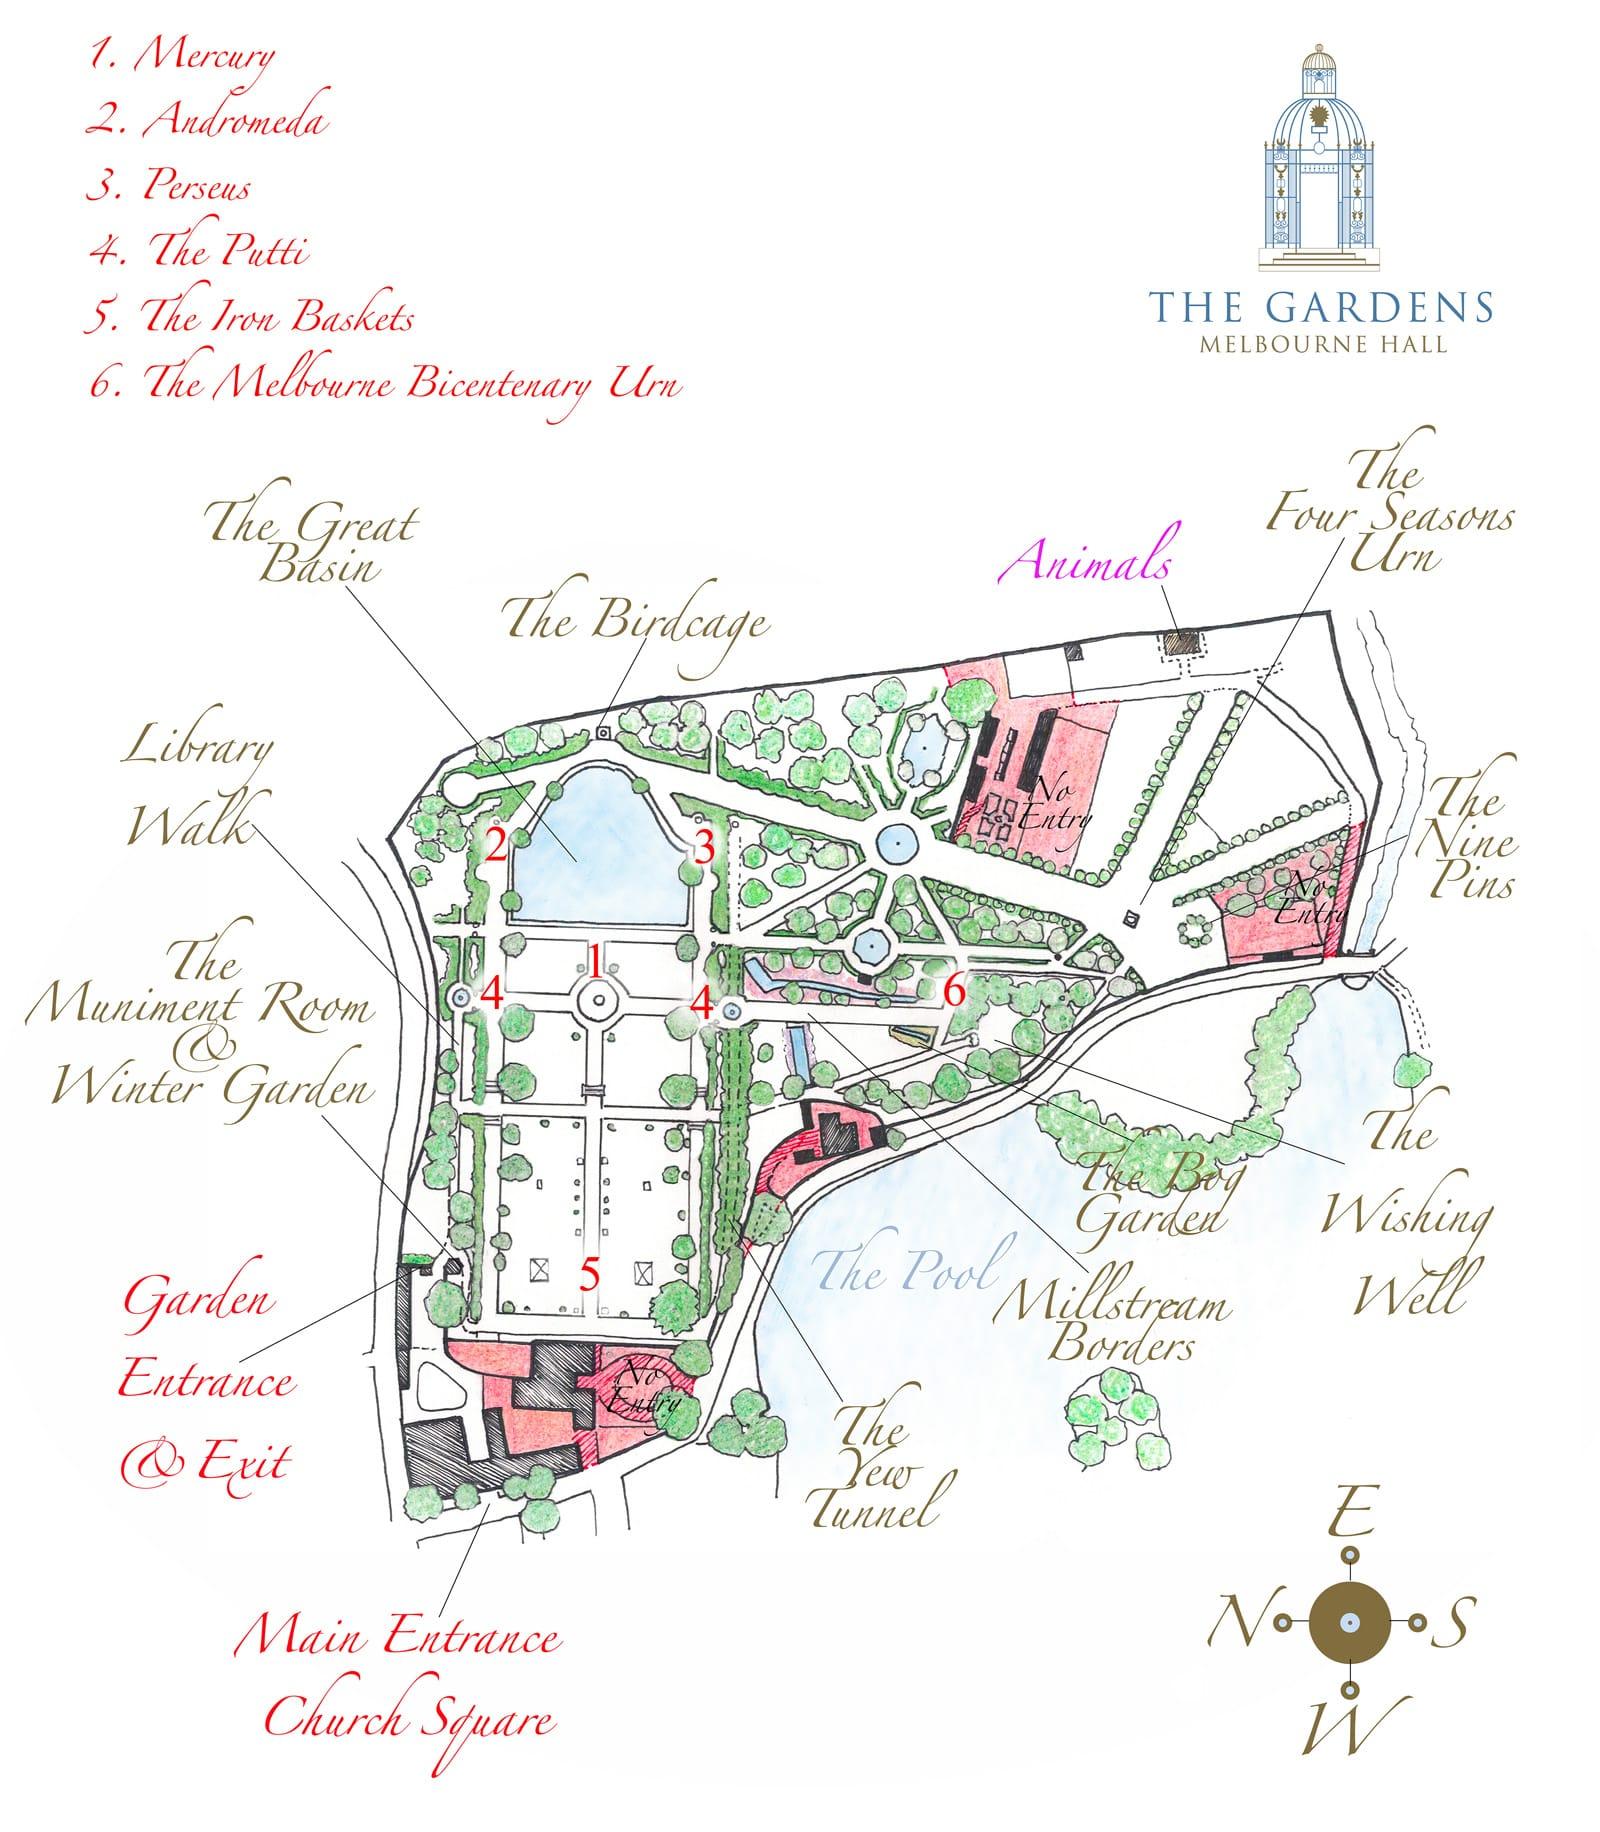 Melbourne Hall Gardens map